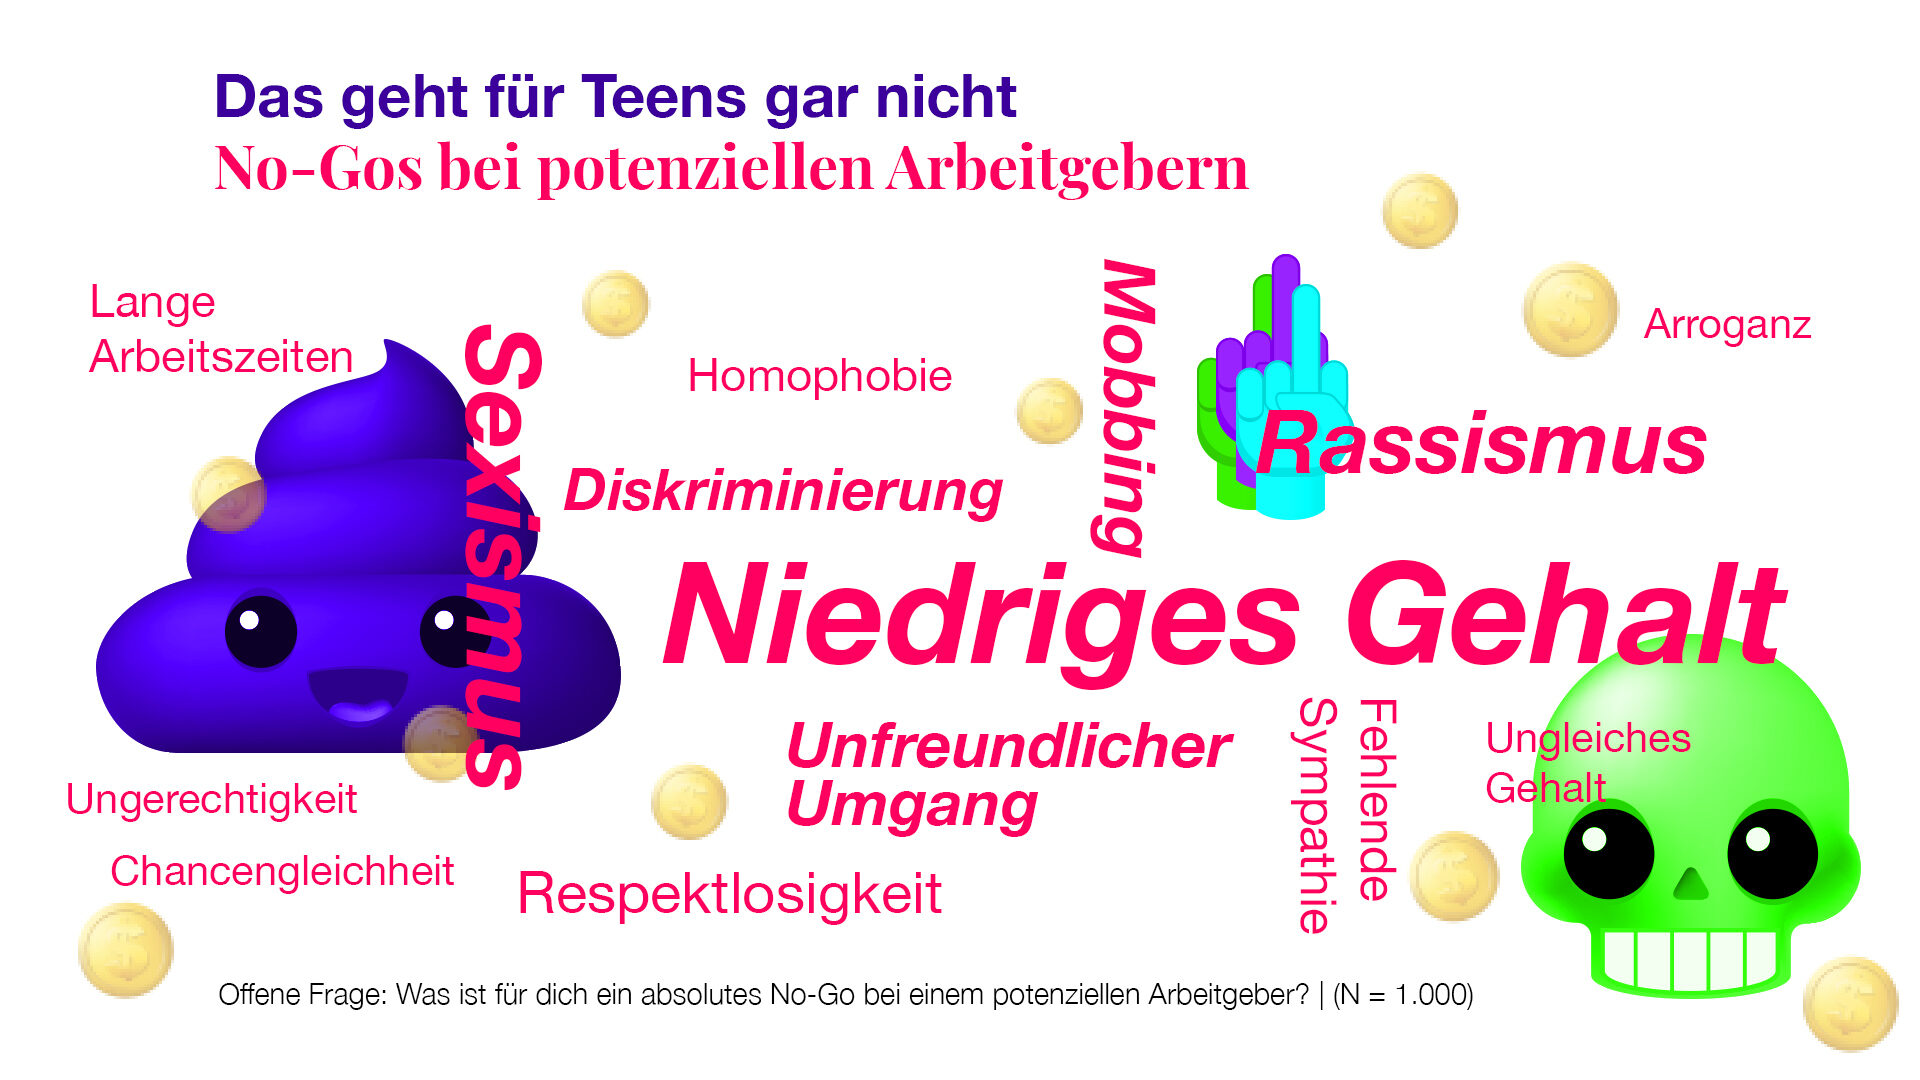 Teengeist Grafik: No-Gos bei Arbeitgebern